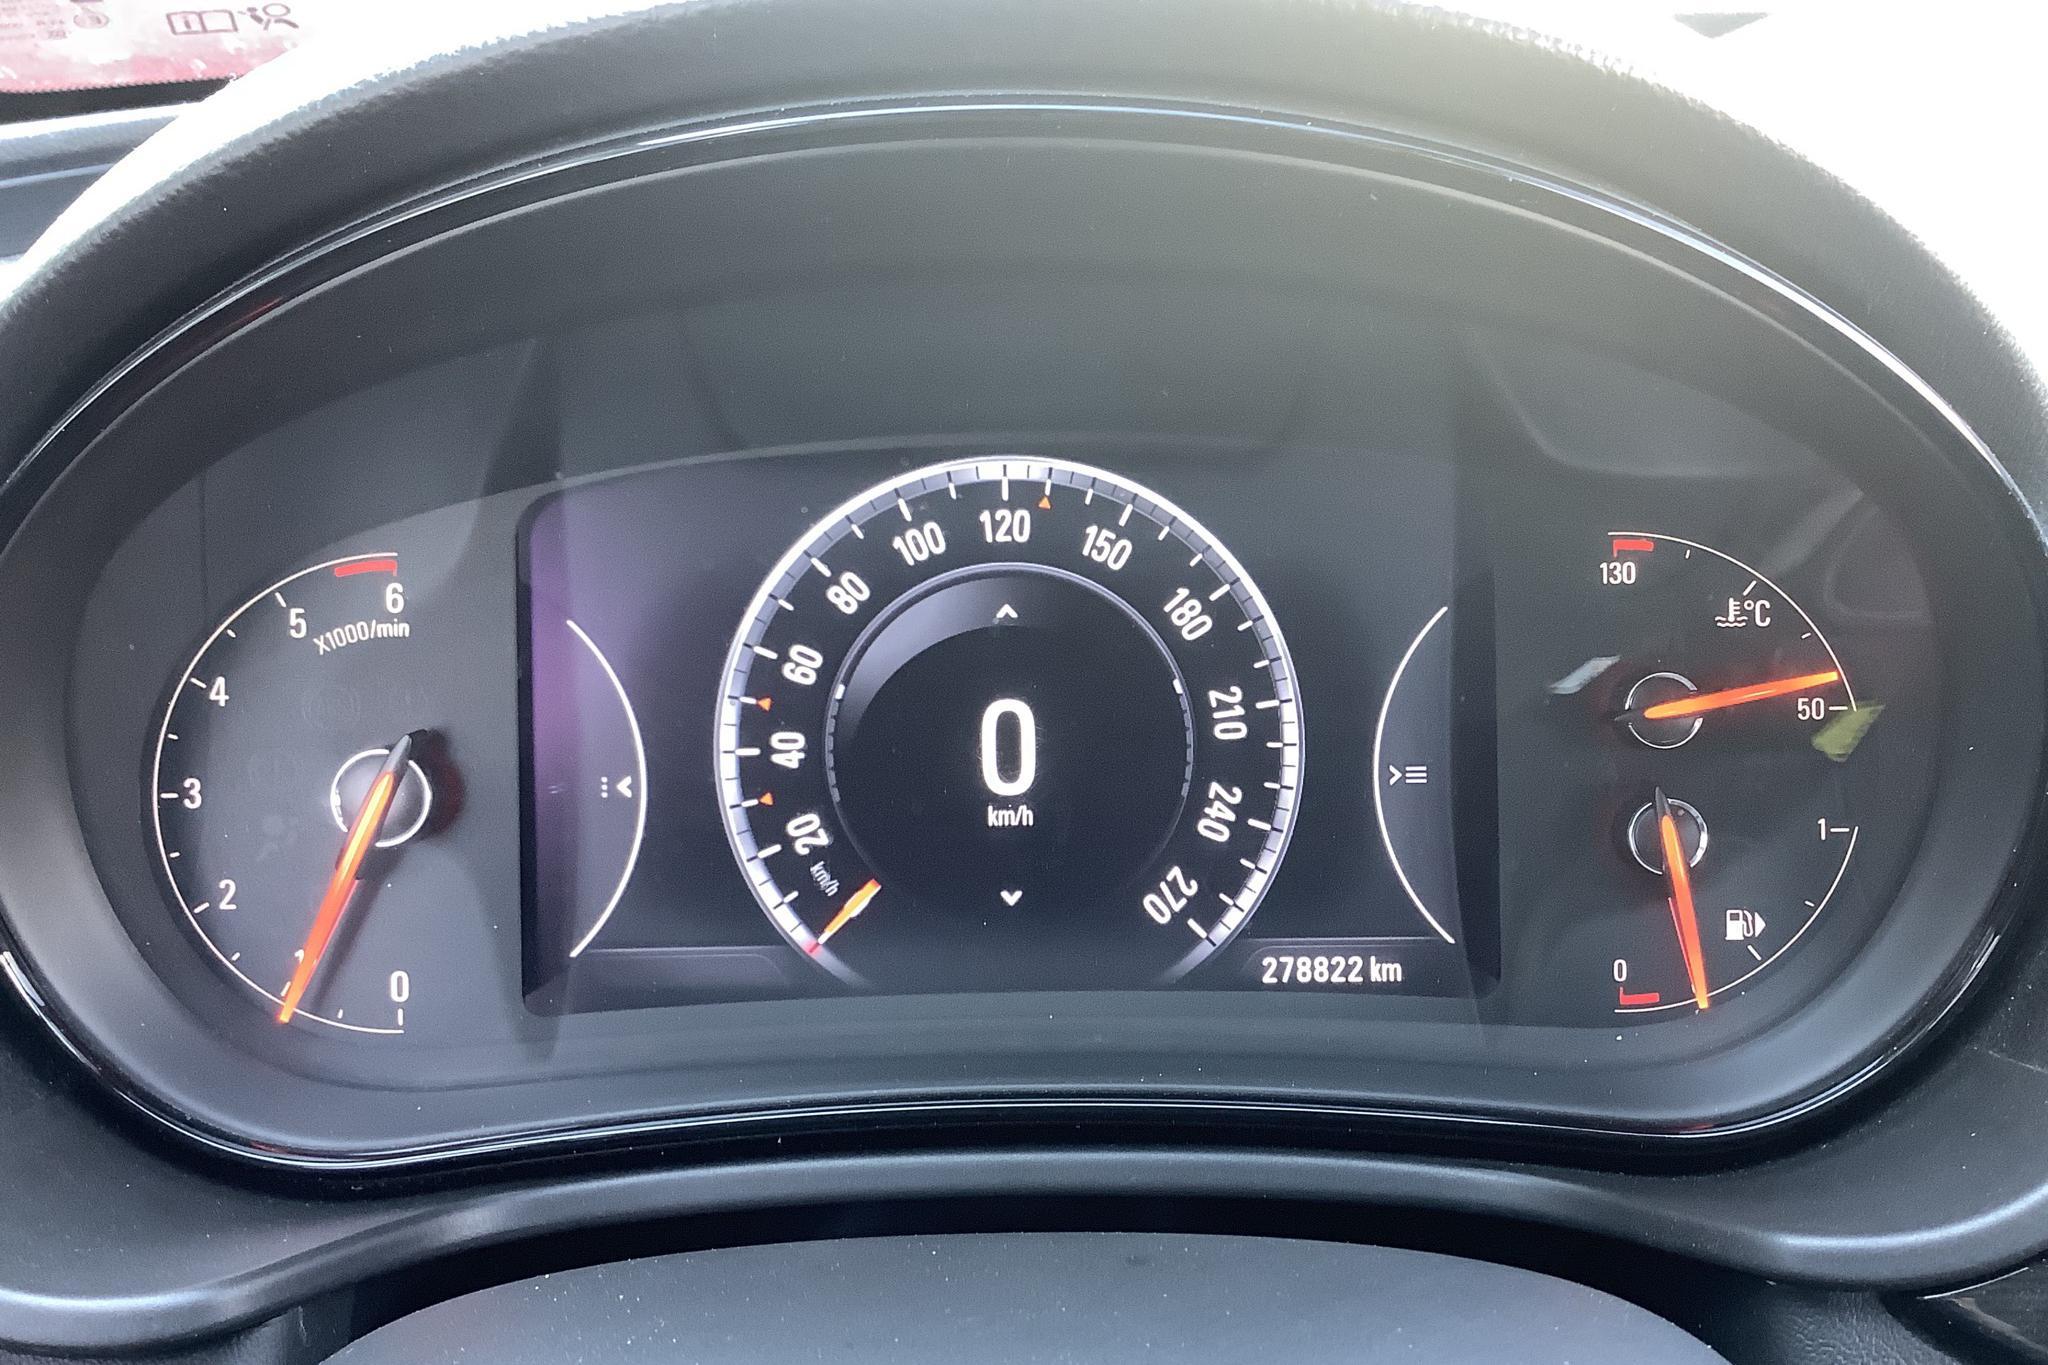 Opel Insignia 2.0 CDTI ecoFLEX Sports Tourer (140hk) - 27 883 mil - Manuell - grå - 2014